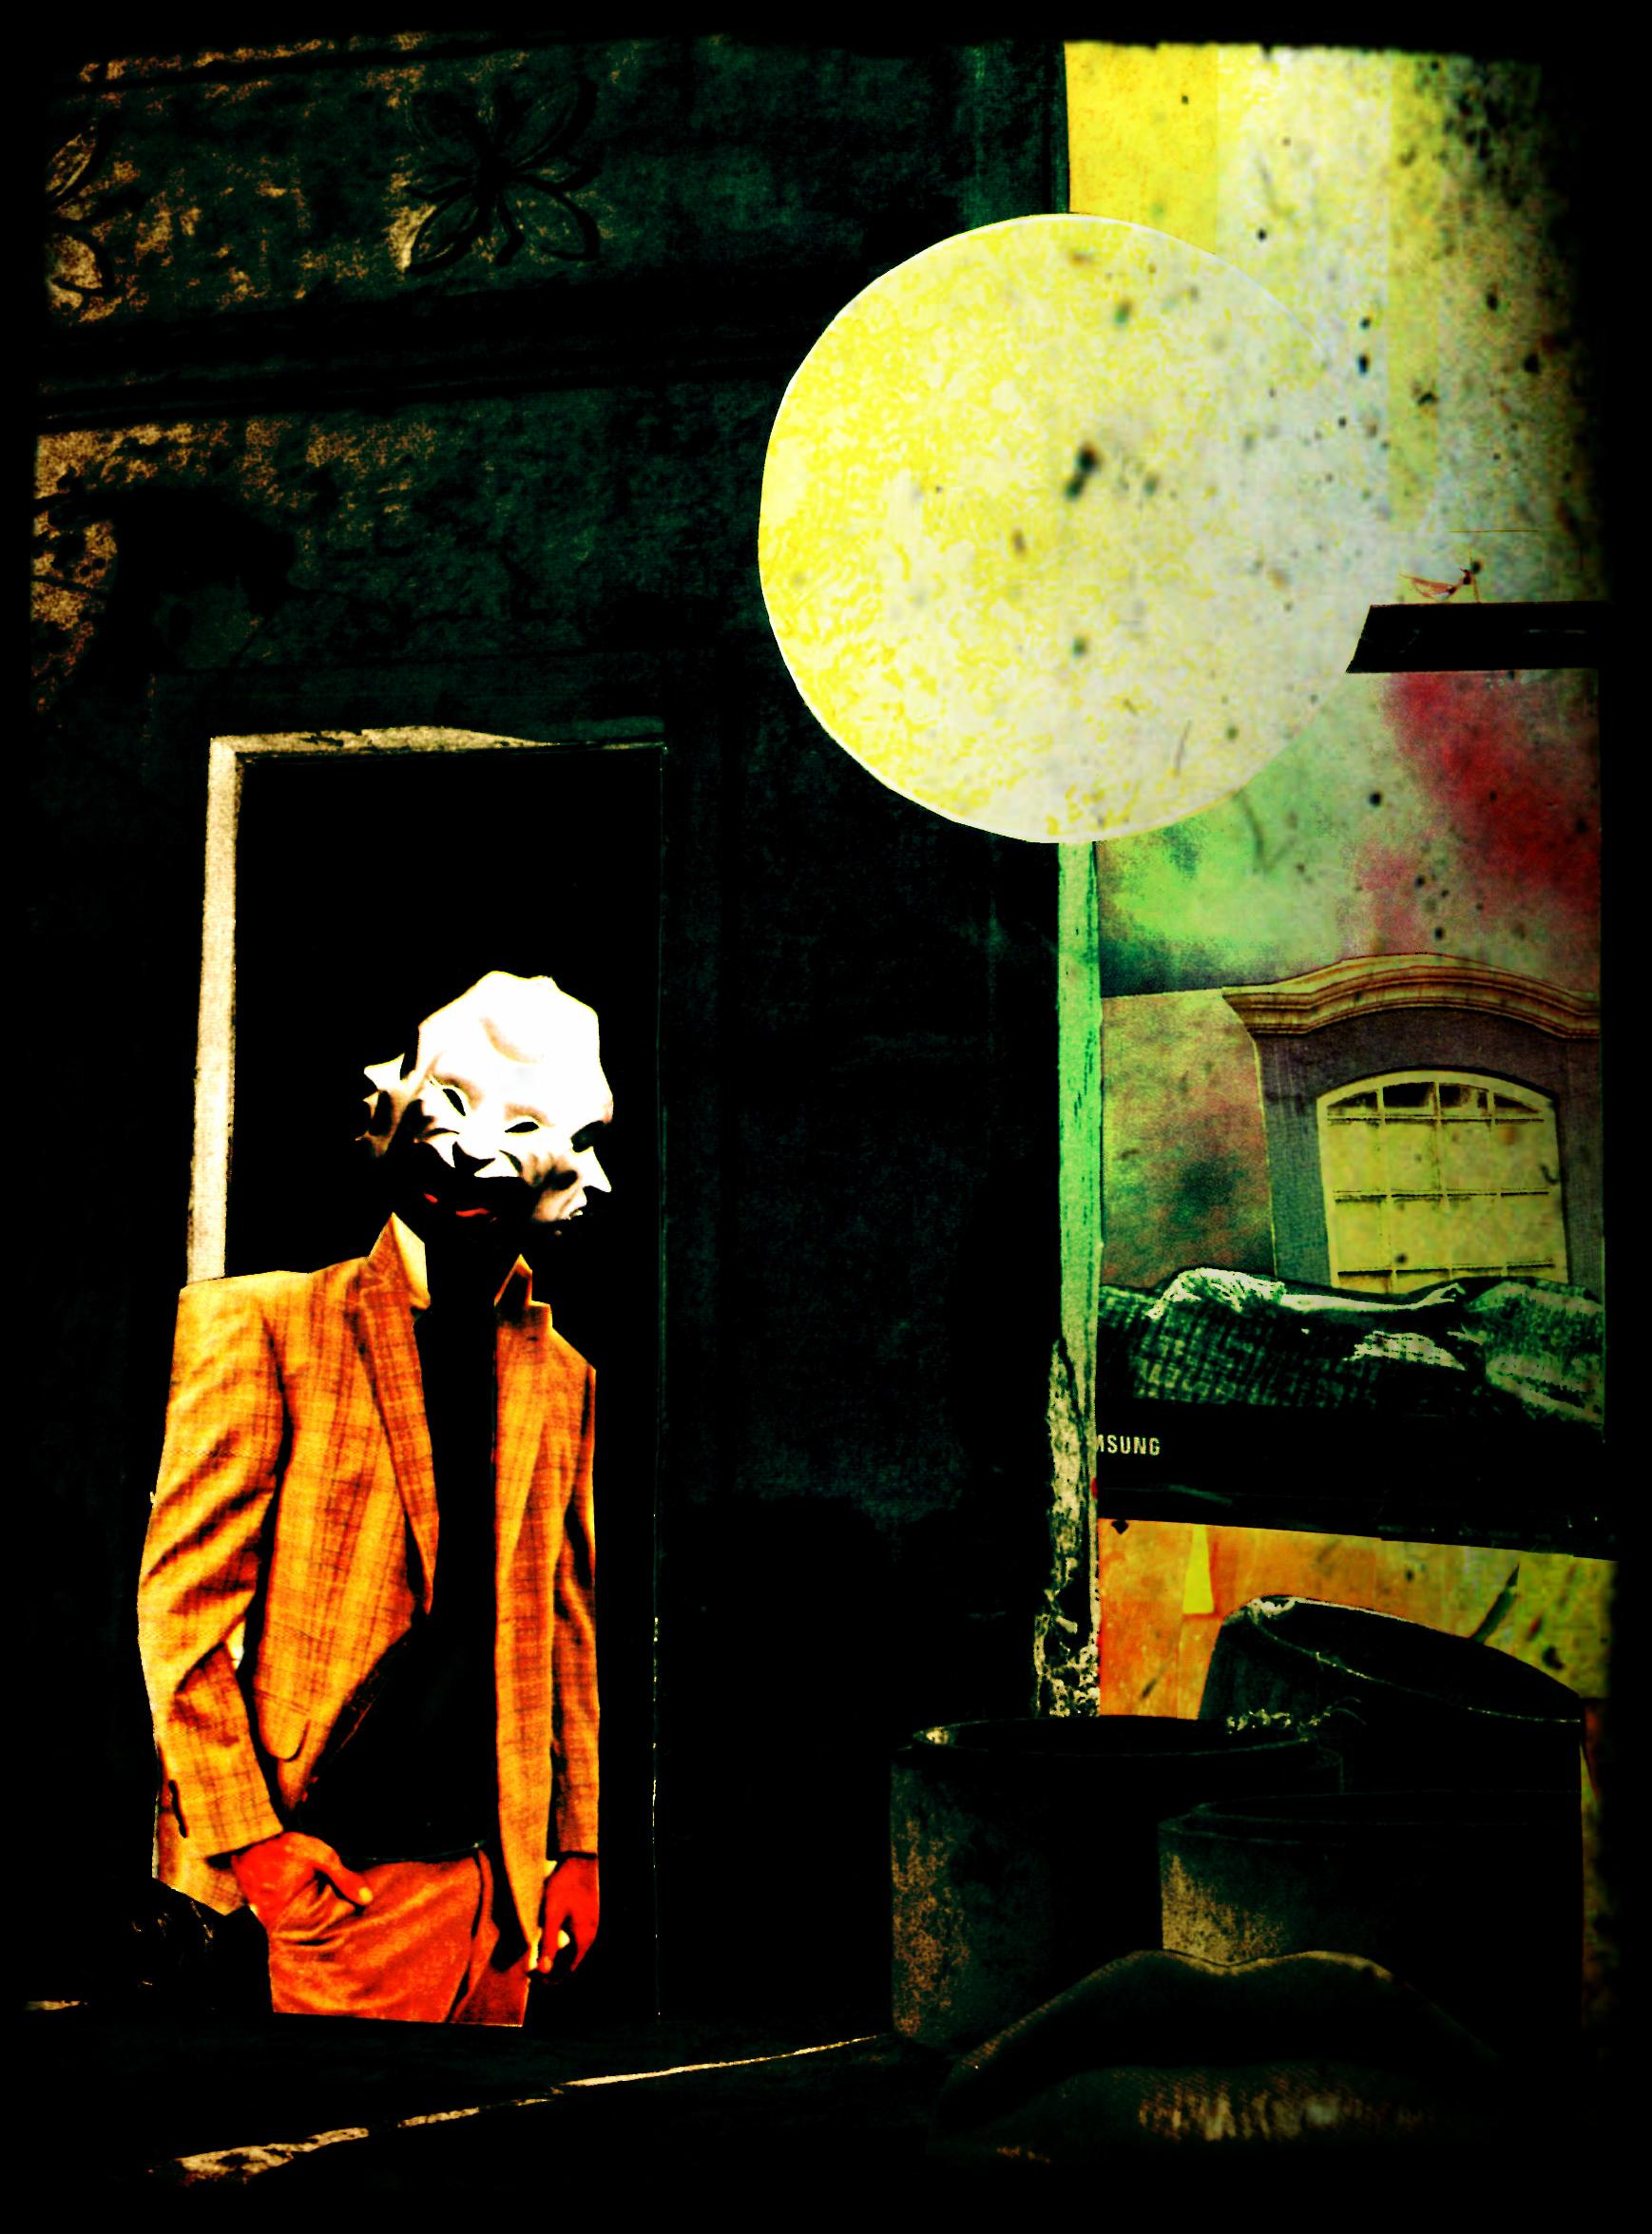 1-conto-pedro-e-pandora-jan-2014